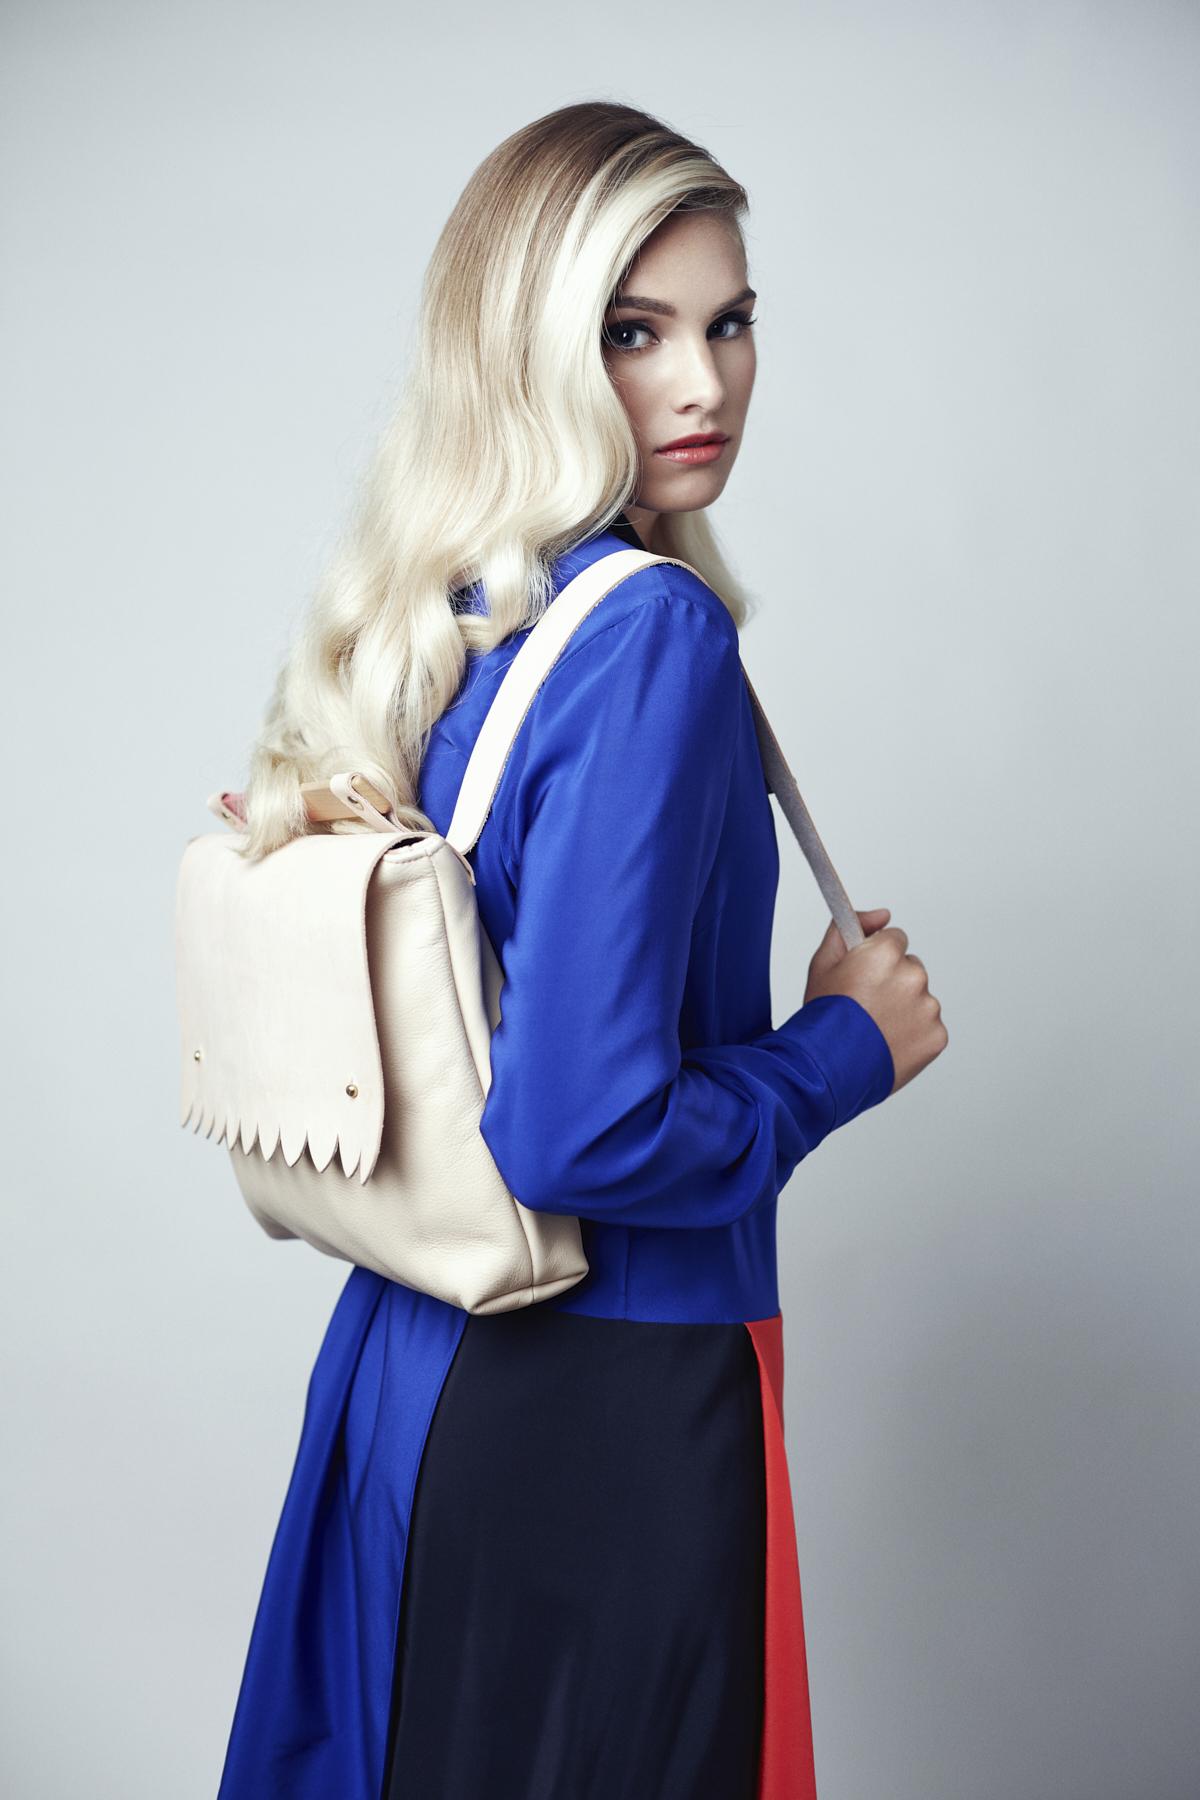 Emilie_Tournevache_Photographer_Montreal_Fashion